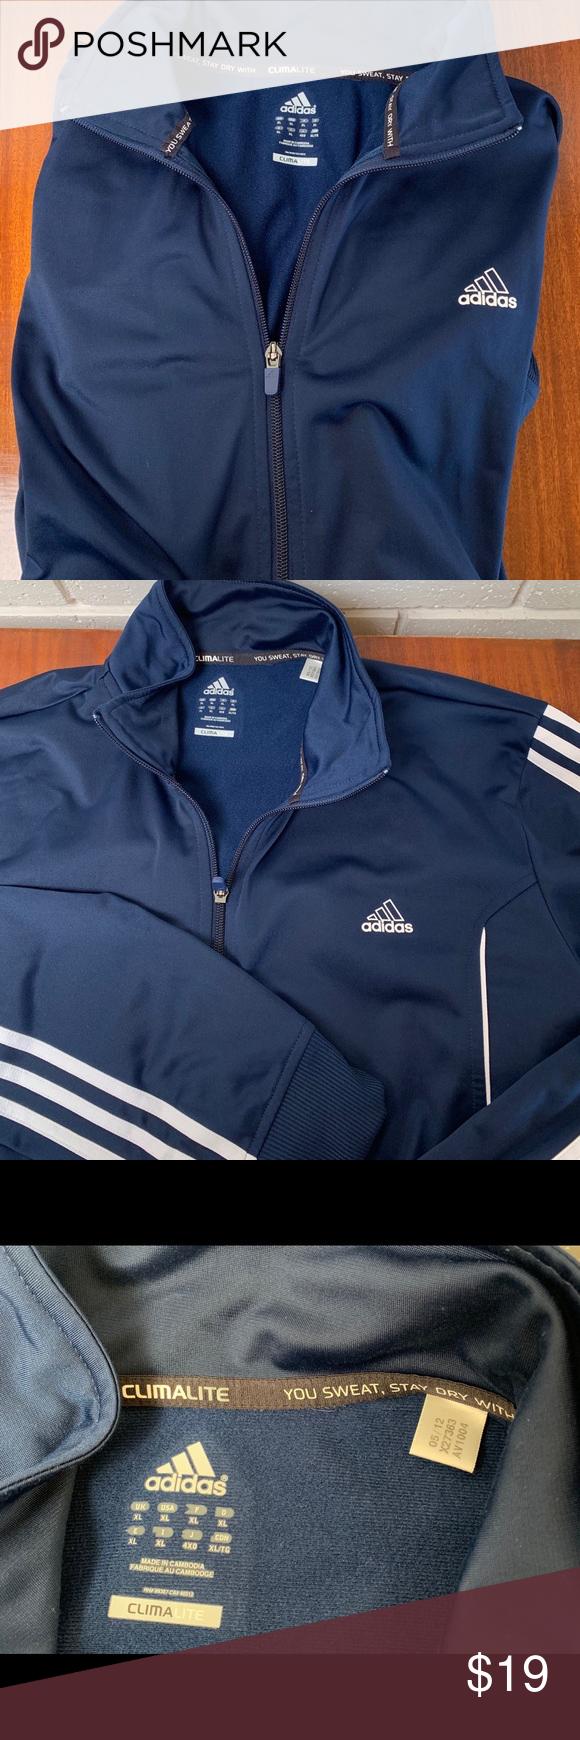 adidas Jackets & Coats | Mens Climalite Sky Blue Jacket